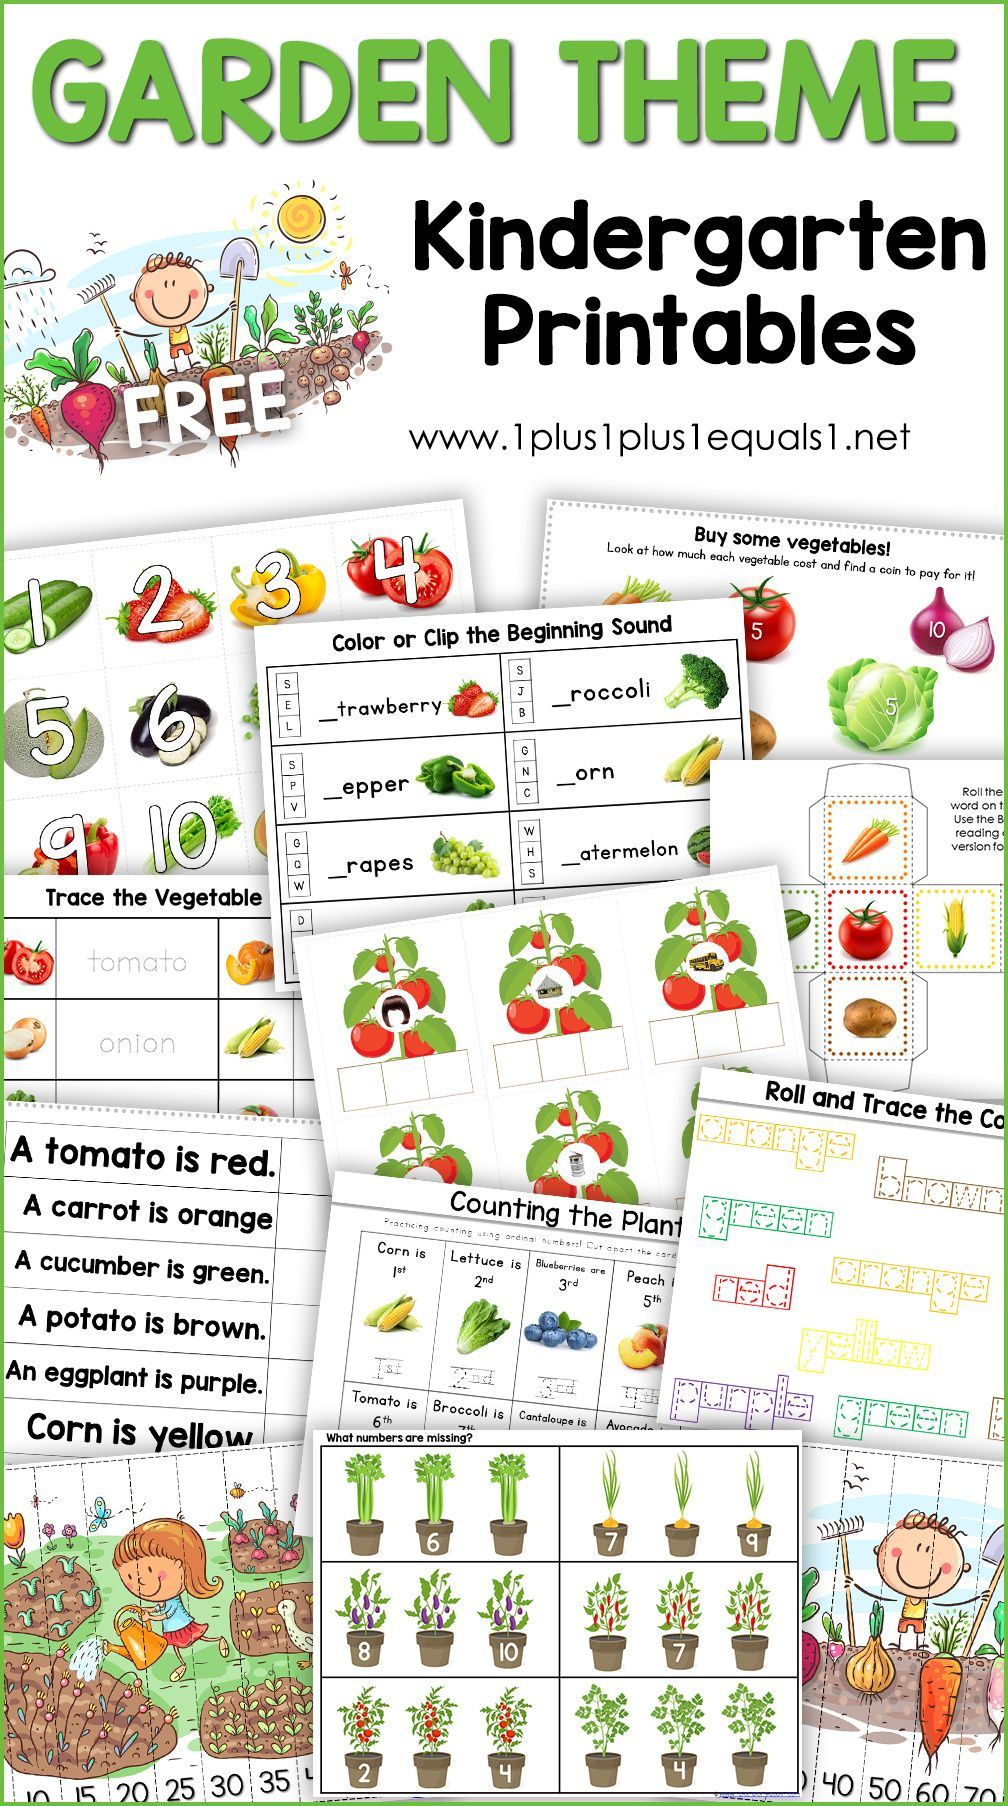 Free Garden Theme Kindergarten Printables 1 1 1 1 In 2021 Garden Theme Kindergarten Kindergarten Printables Free Kindergarten Printables [ 1806 x 1008 Pixel ]